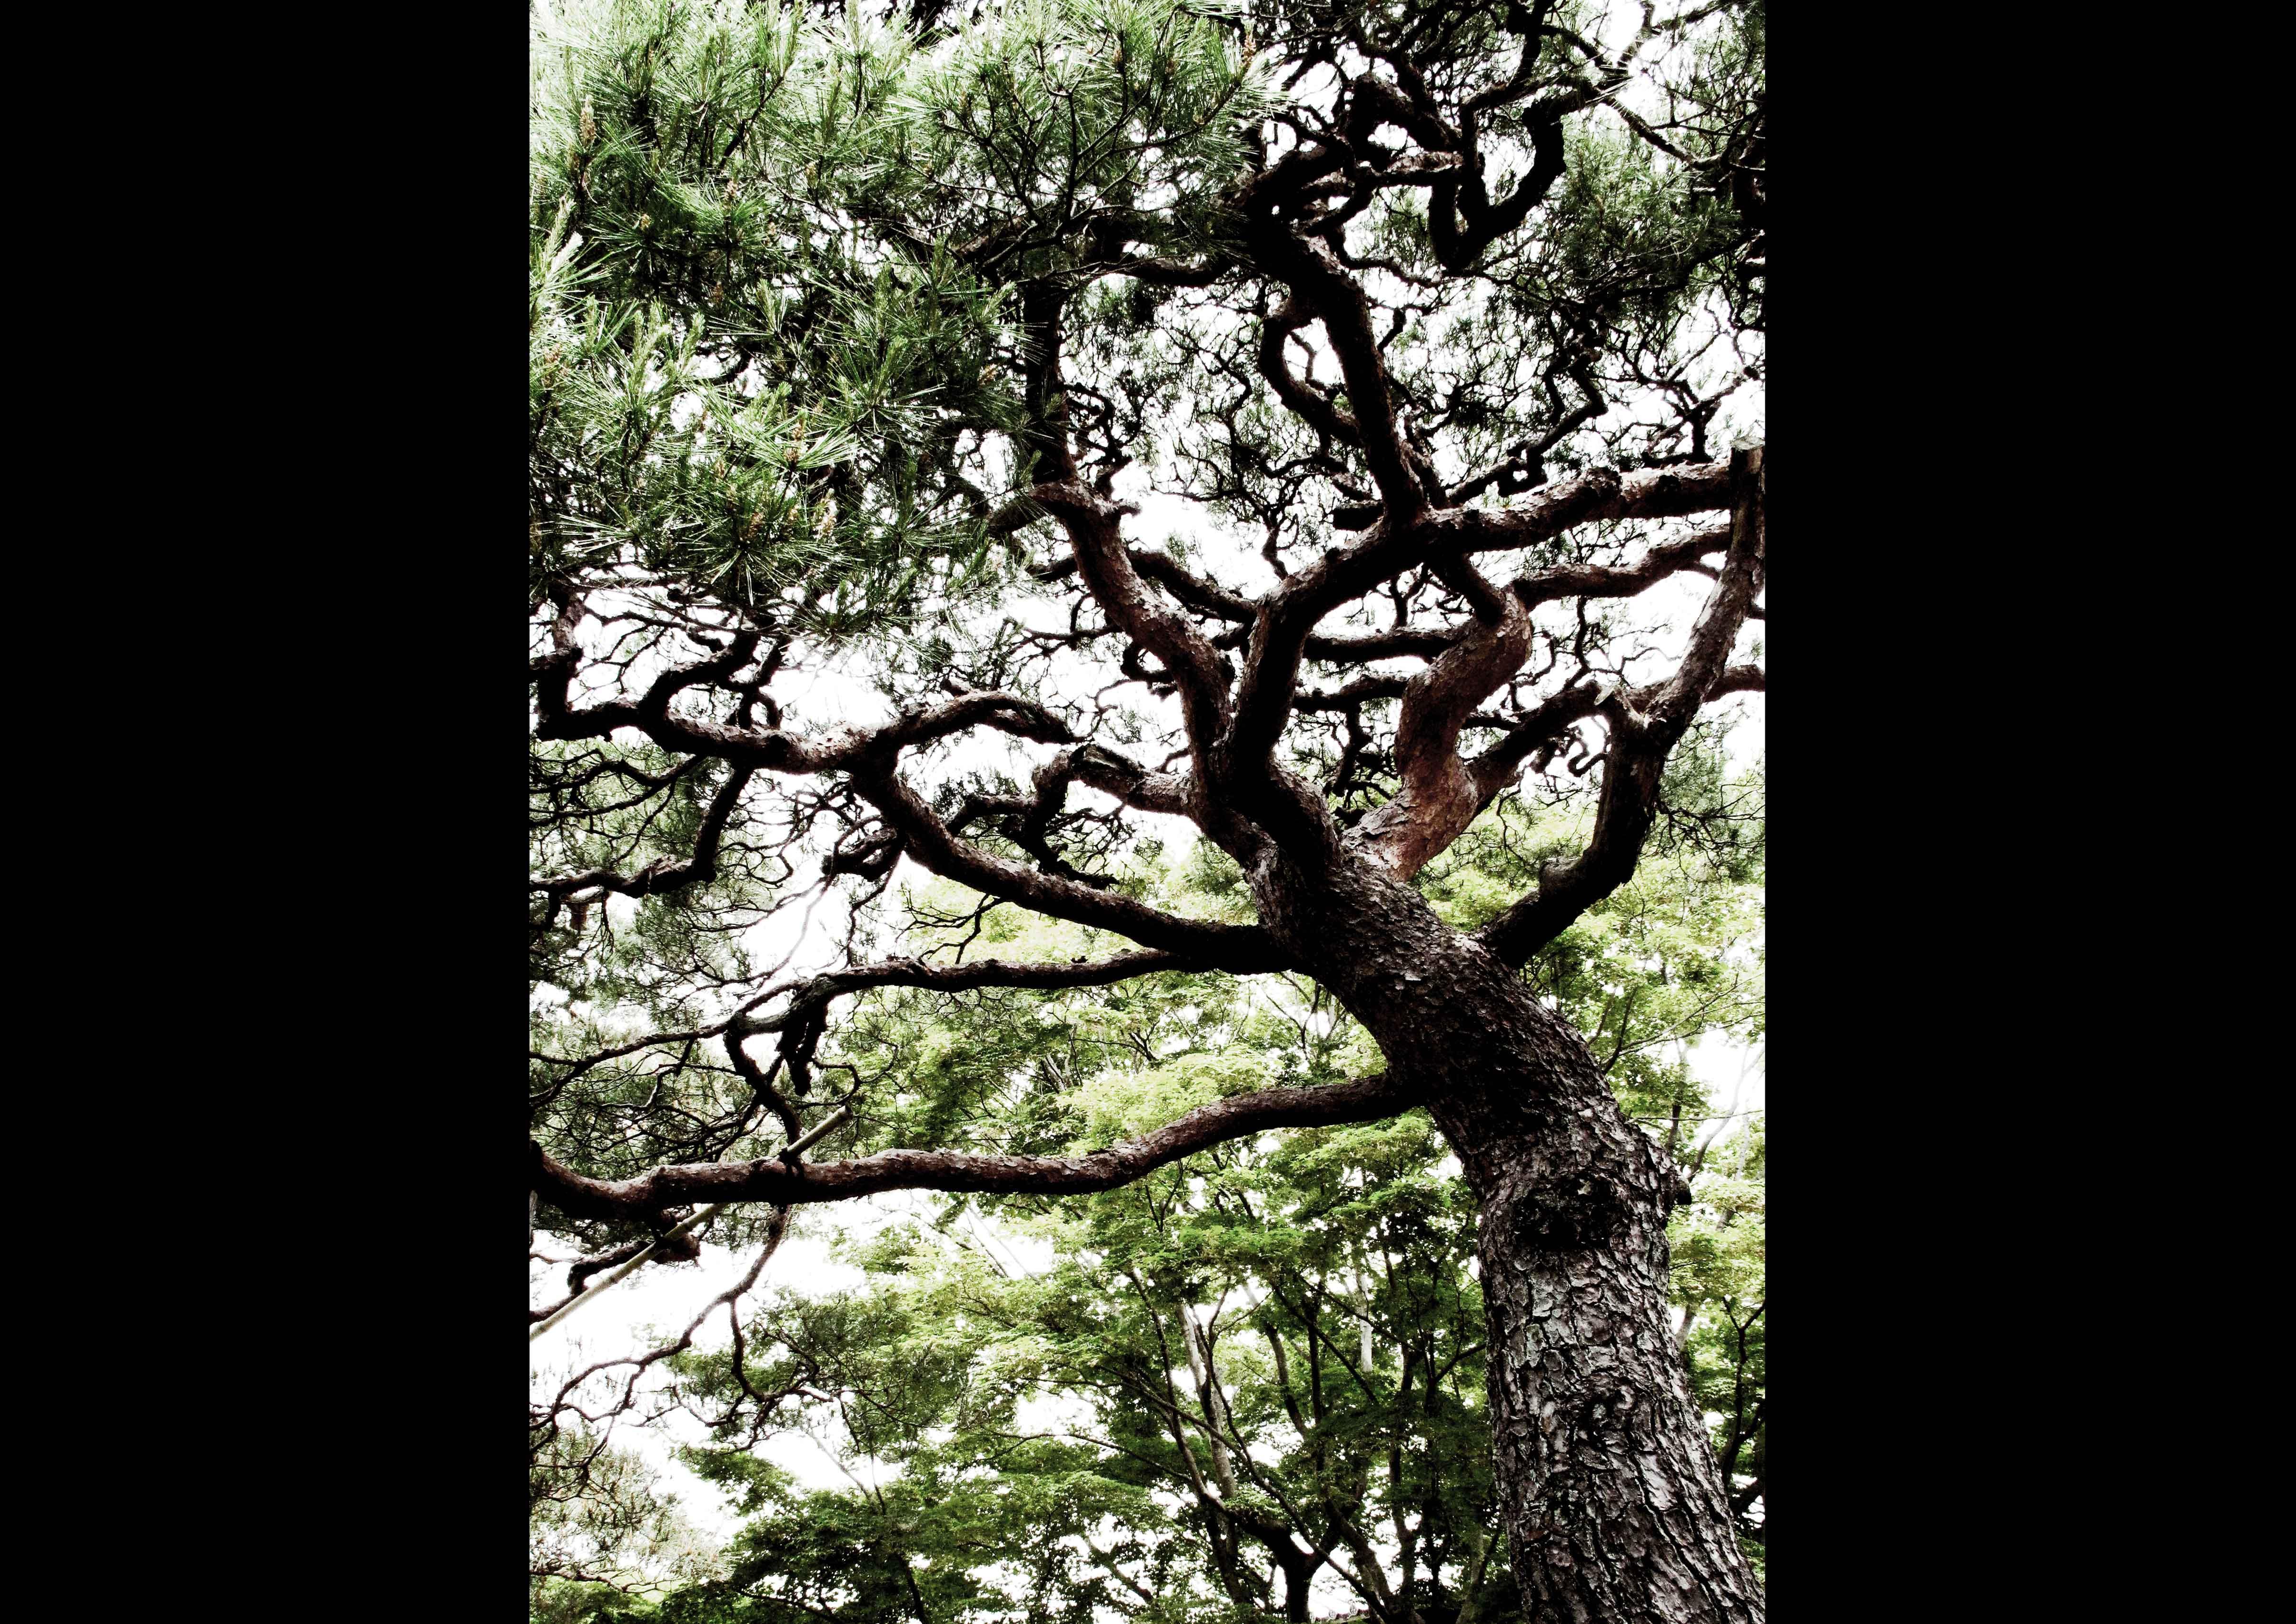 松 pine tree